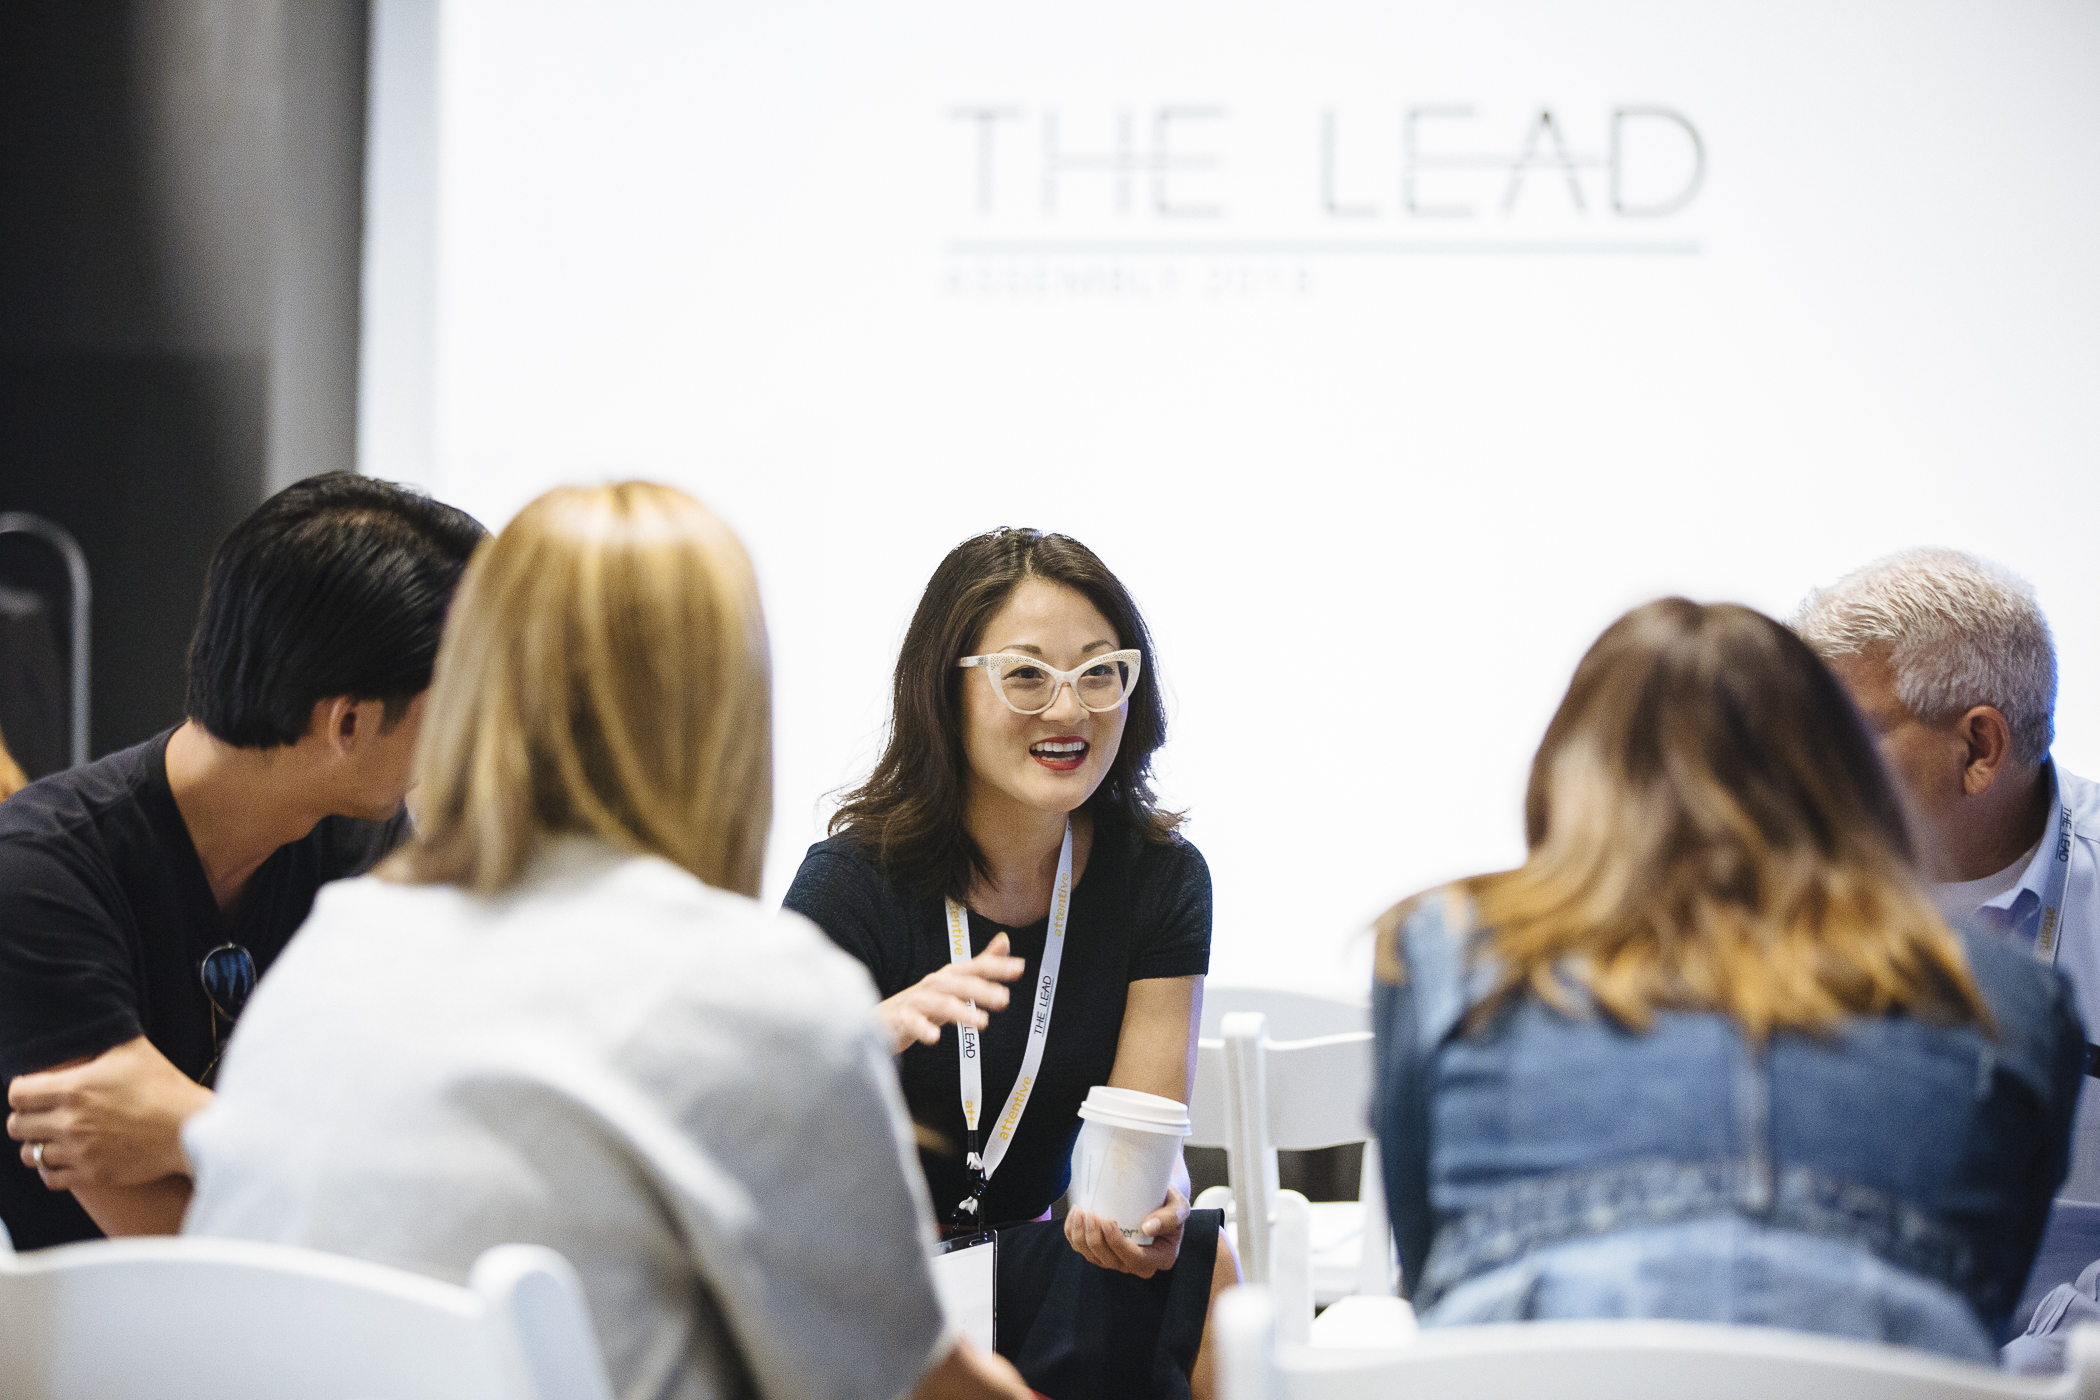 Sara Kerens, The Lead, Cadillac House, June 2018